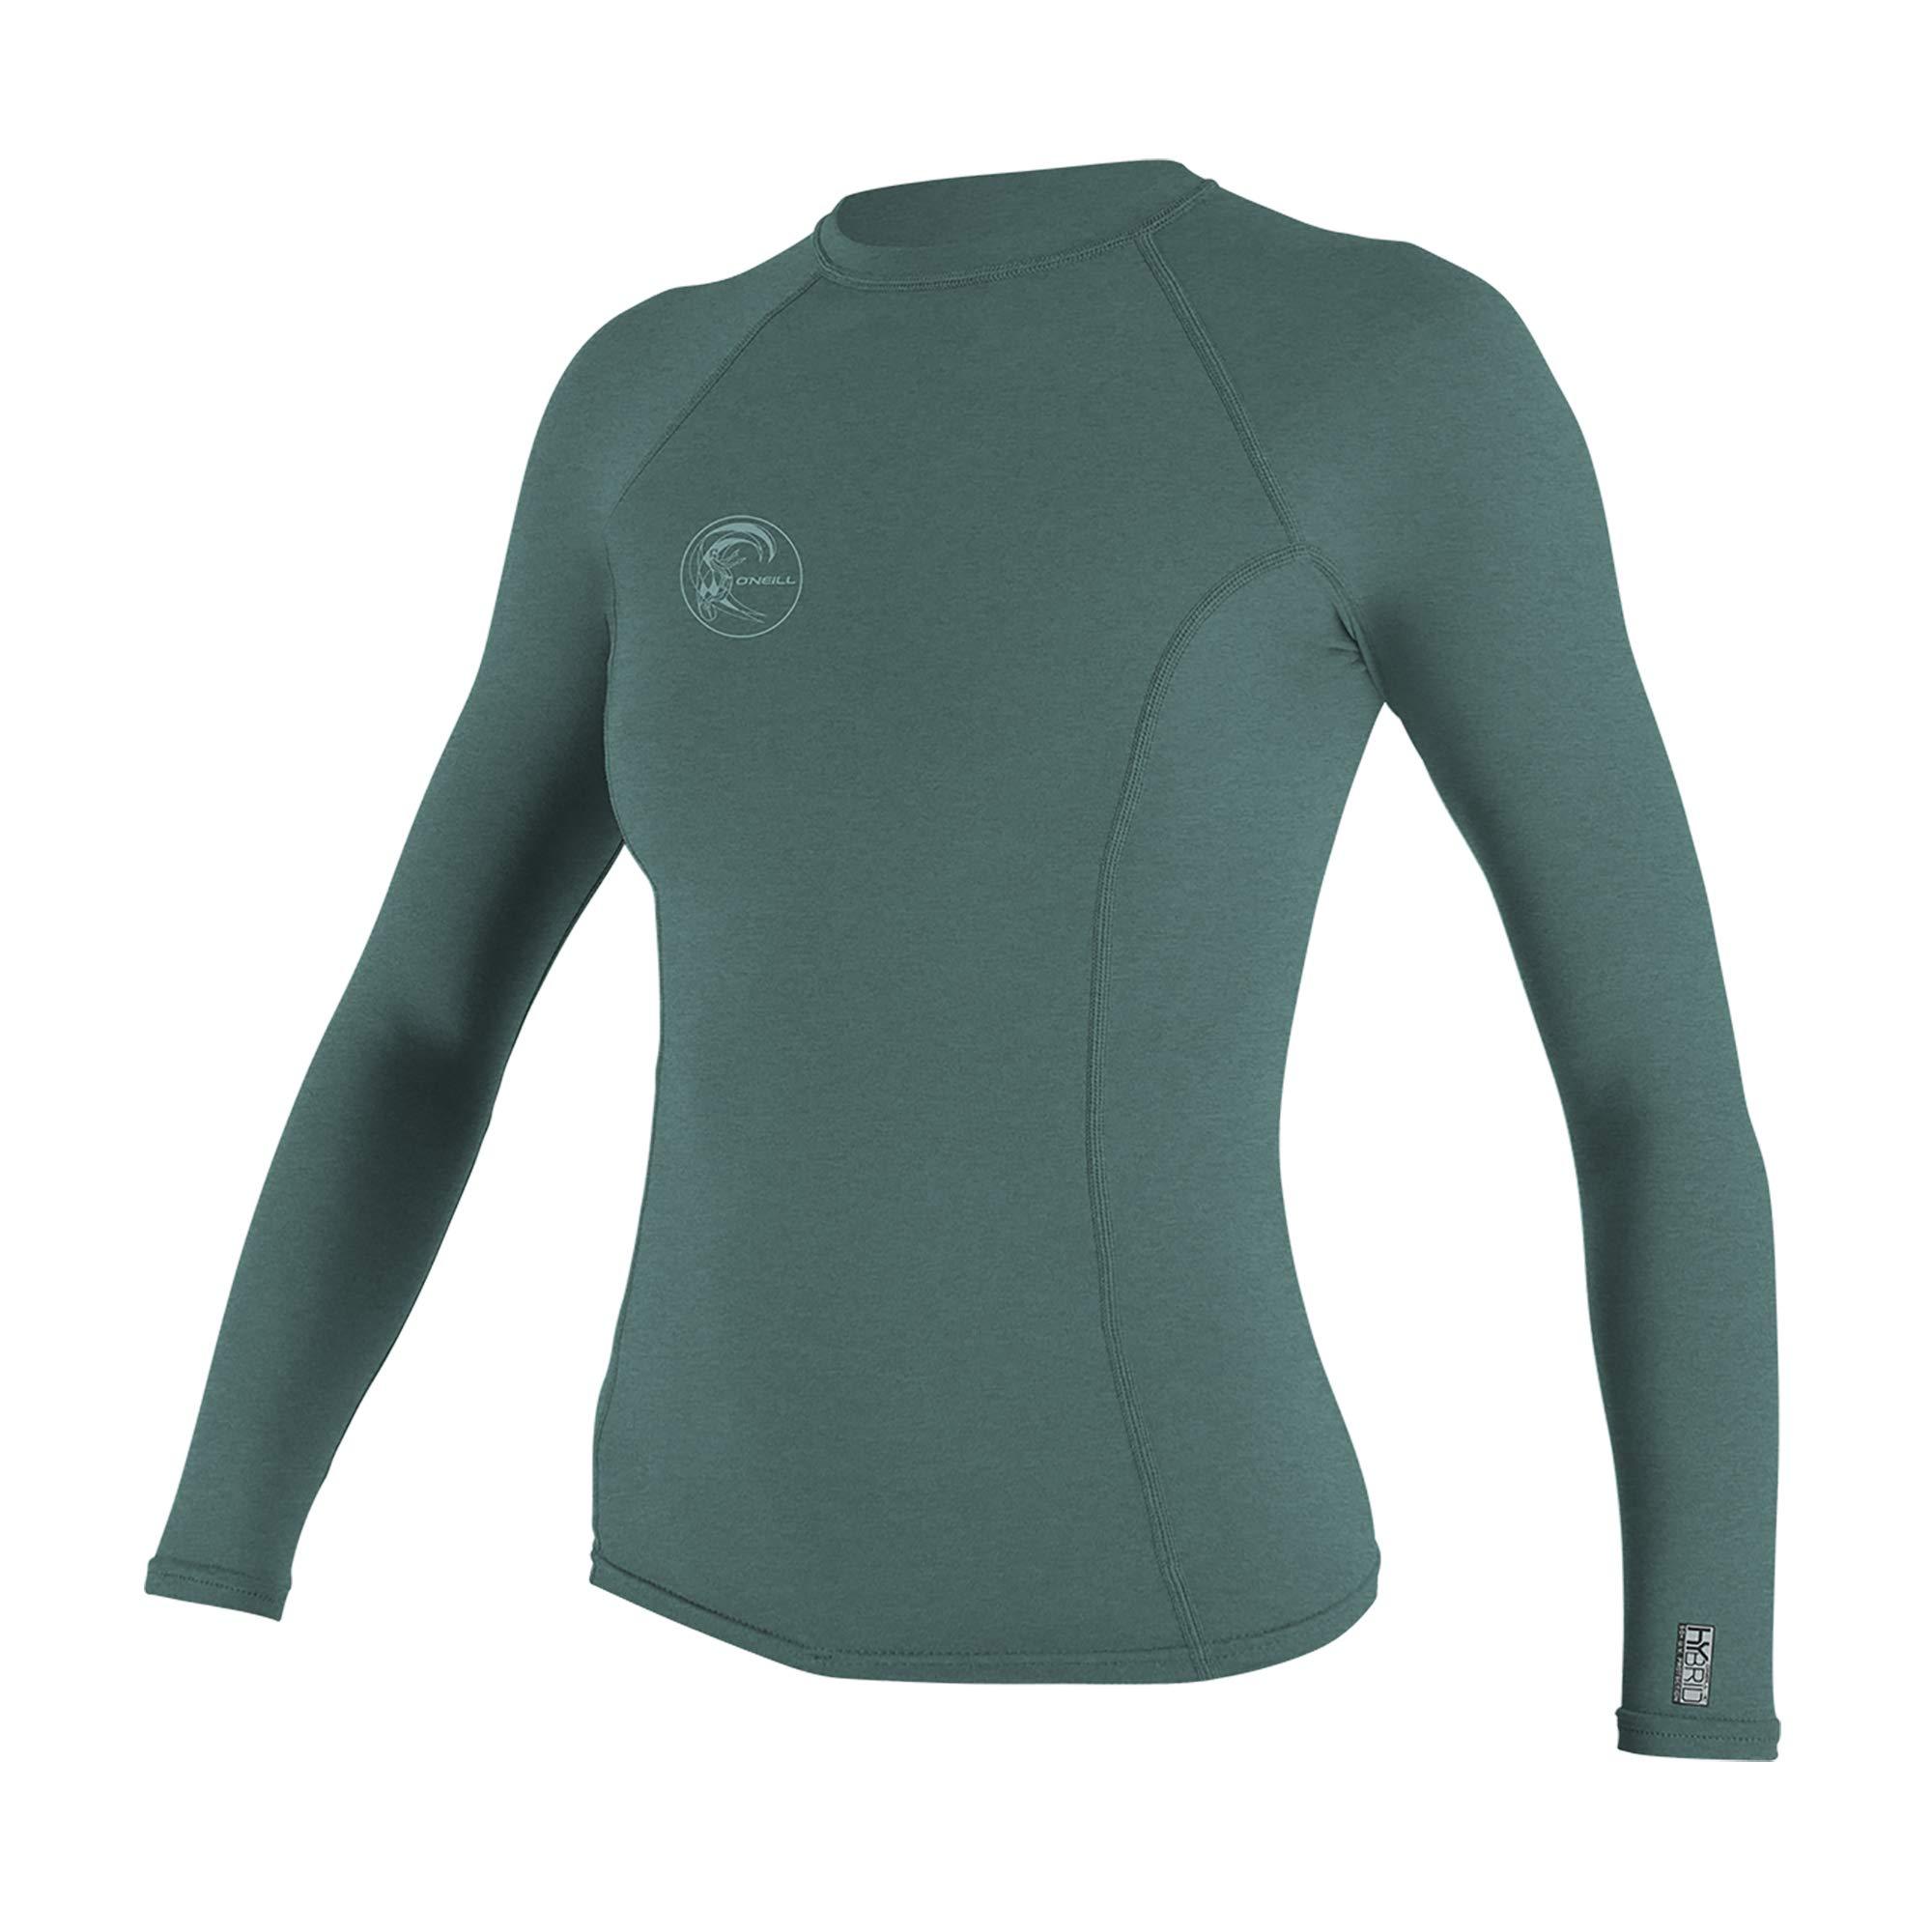 O'Neill Wetsuits Women's Hybrid UPF 50+ Long Sleeve Rash Guard, Eucalyptus, X-Large by O'Neill Wetsuits